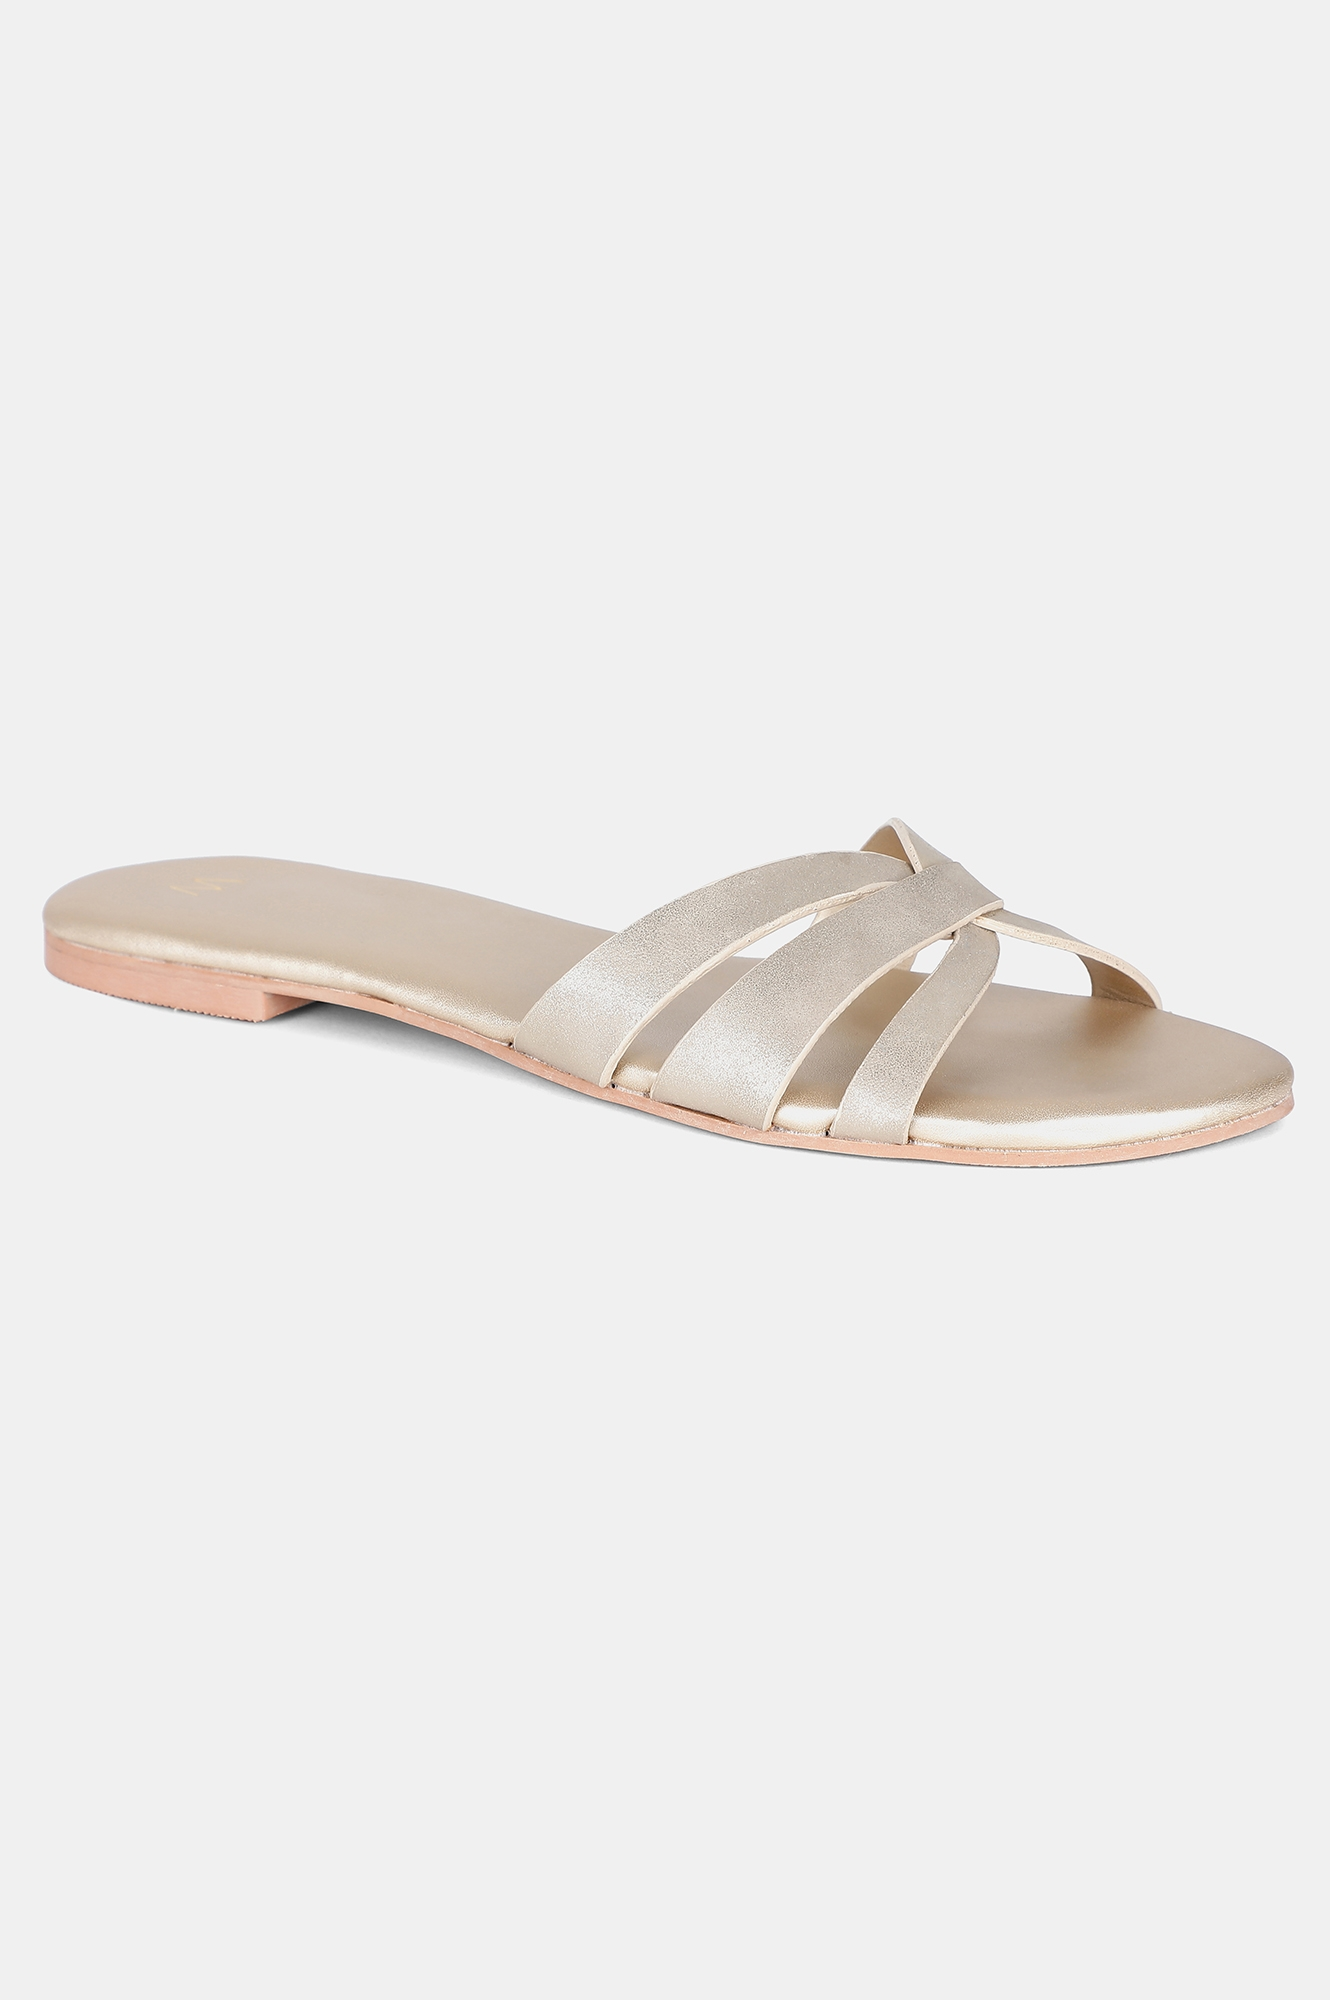 W | Light Gold Almond Toe Textured Flat